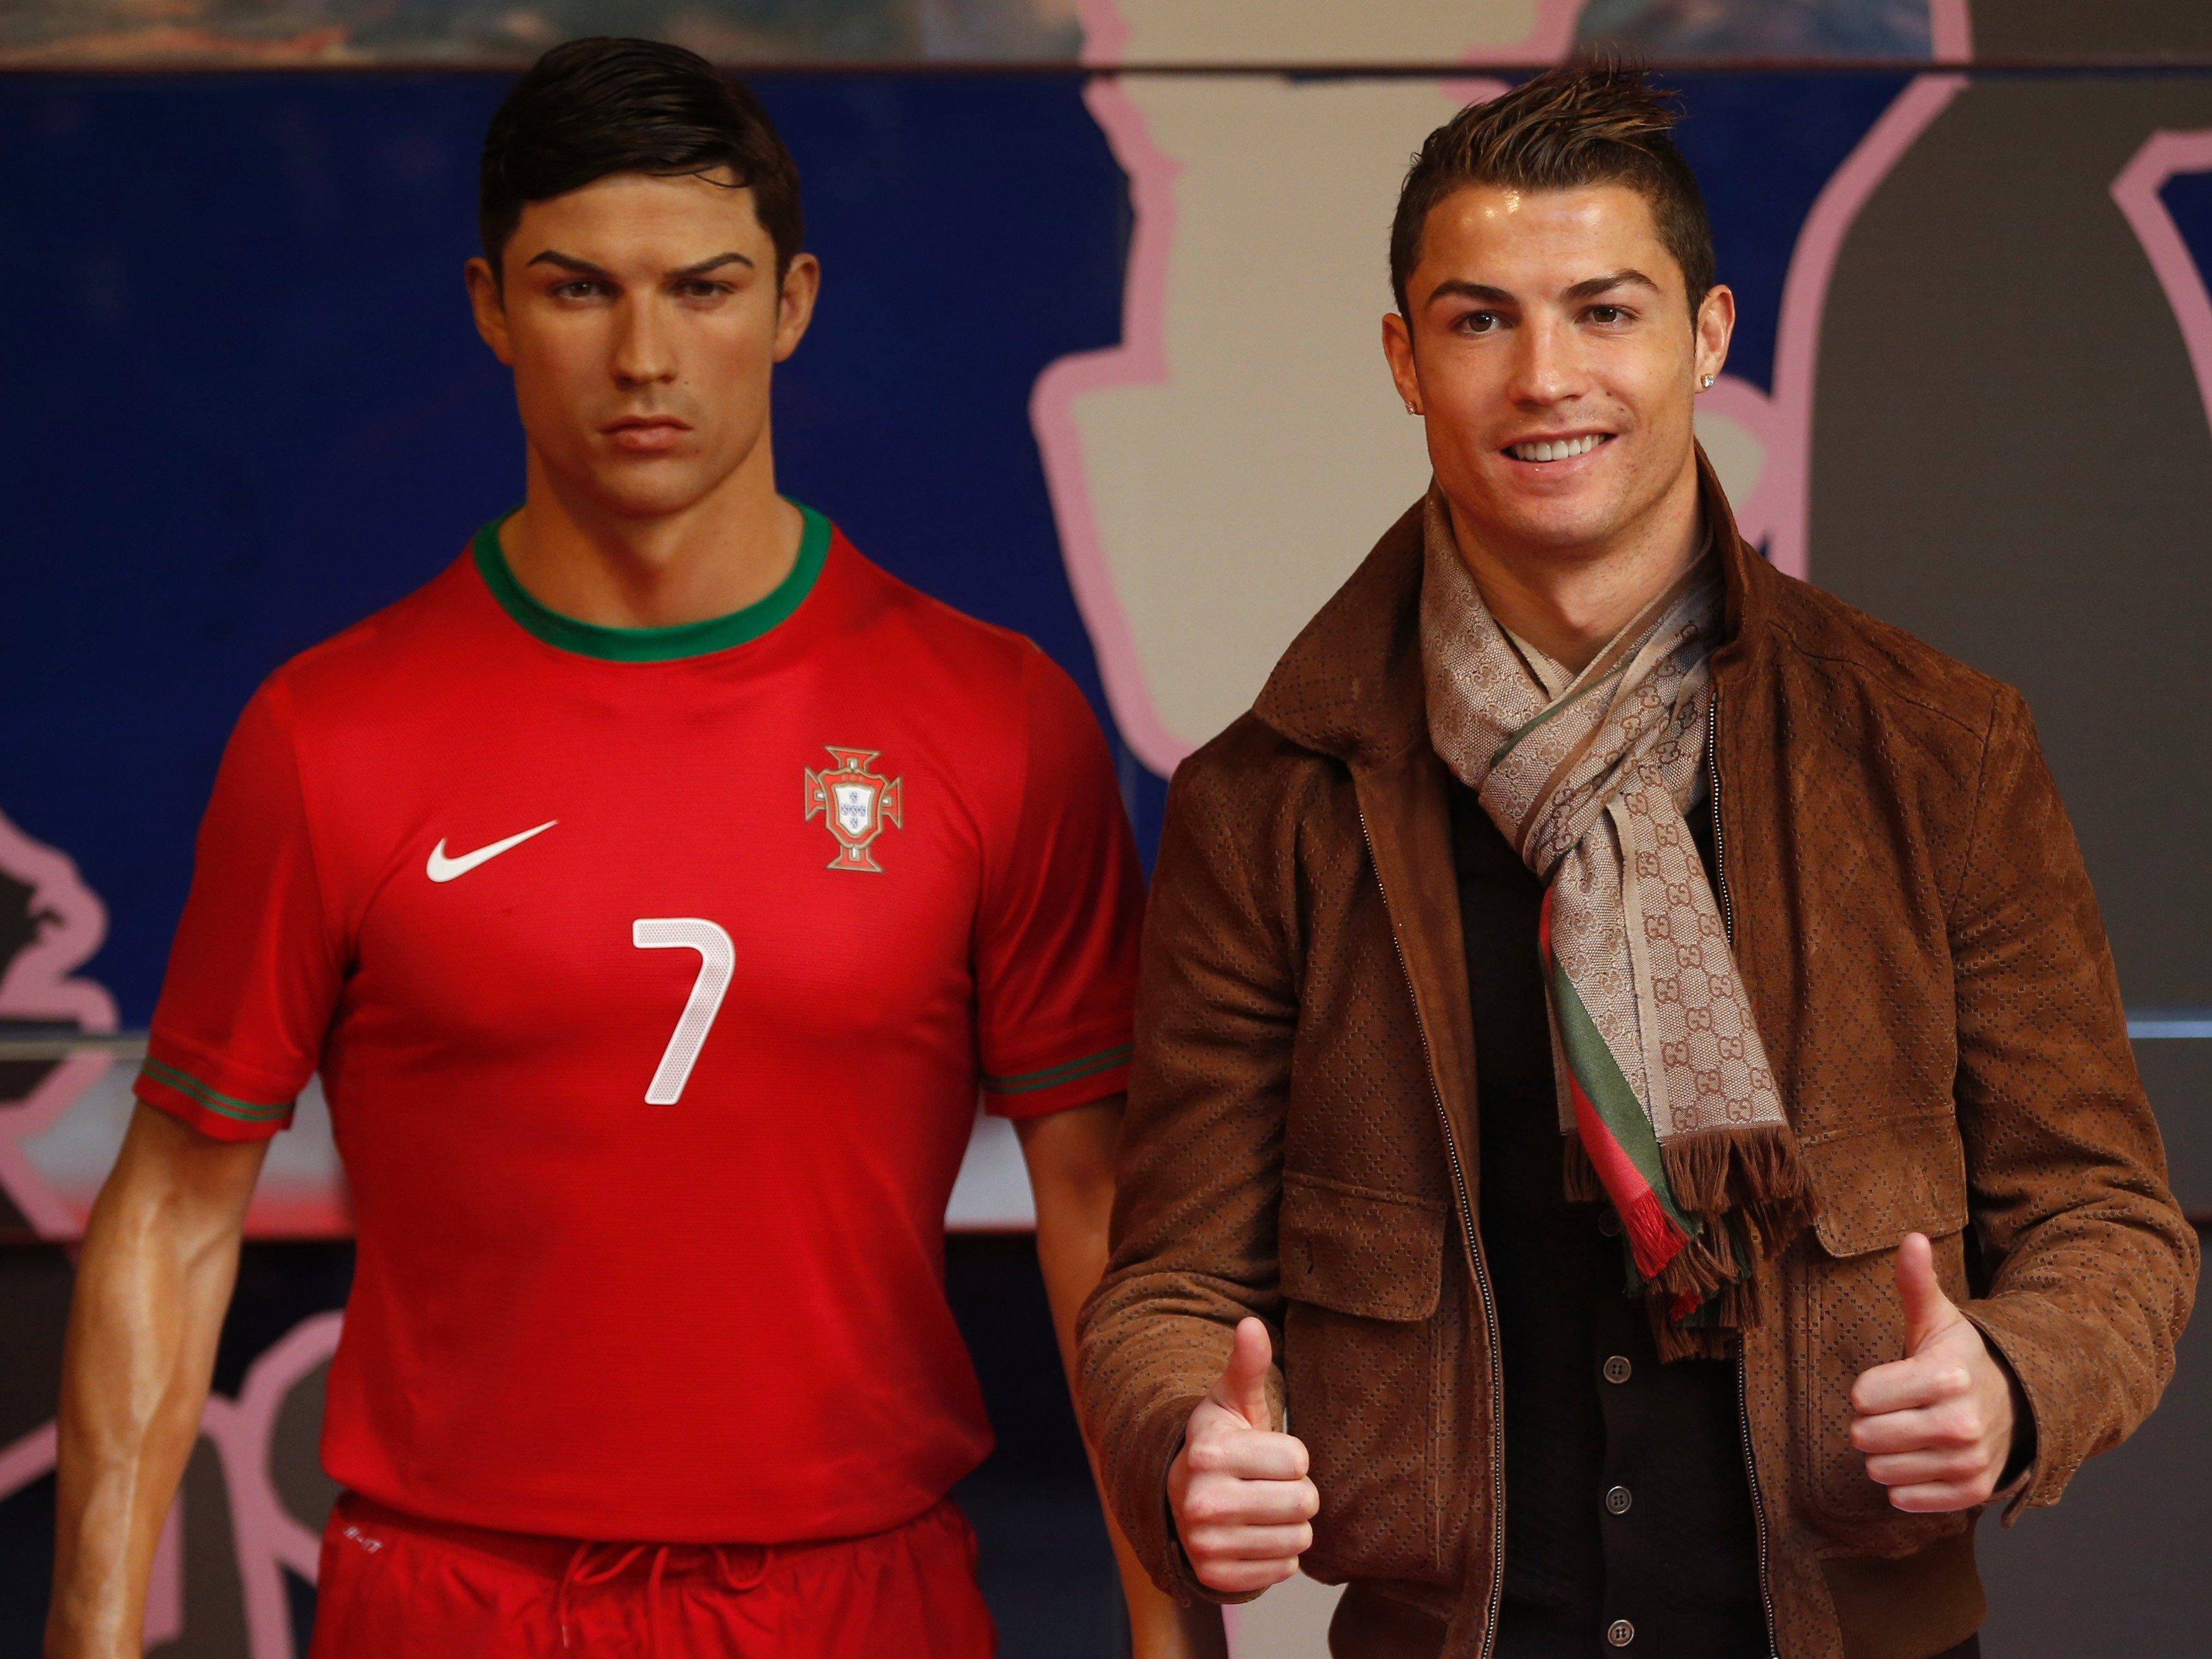 Cristiano, Ronaldo, NIKE, Billions, Samsung, KFC, Herbalife, Castrol, Real Madrid, Portugal